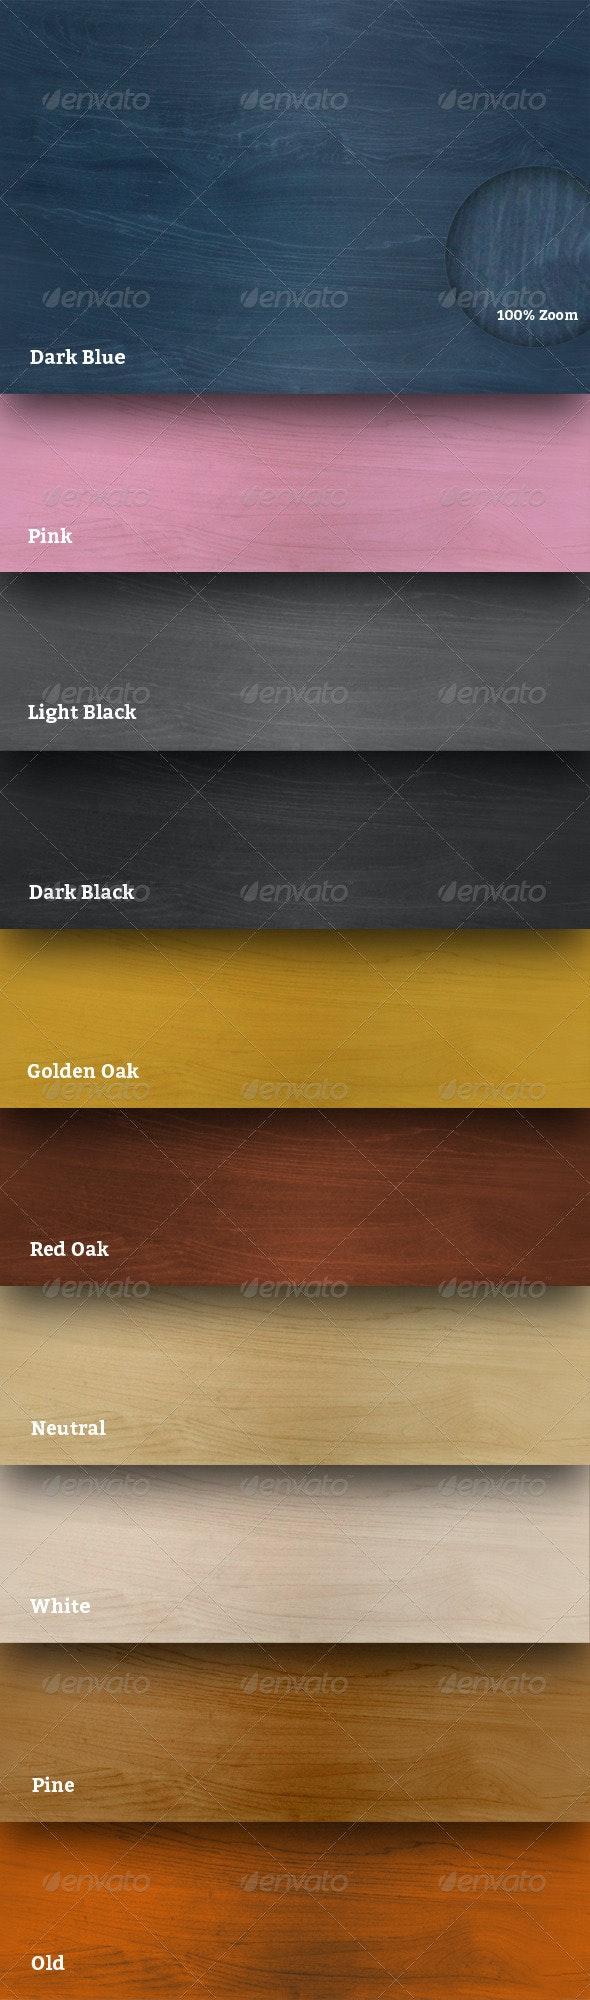 10 Tileable Wood Textures Photoshop Patterns - Wood Textures